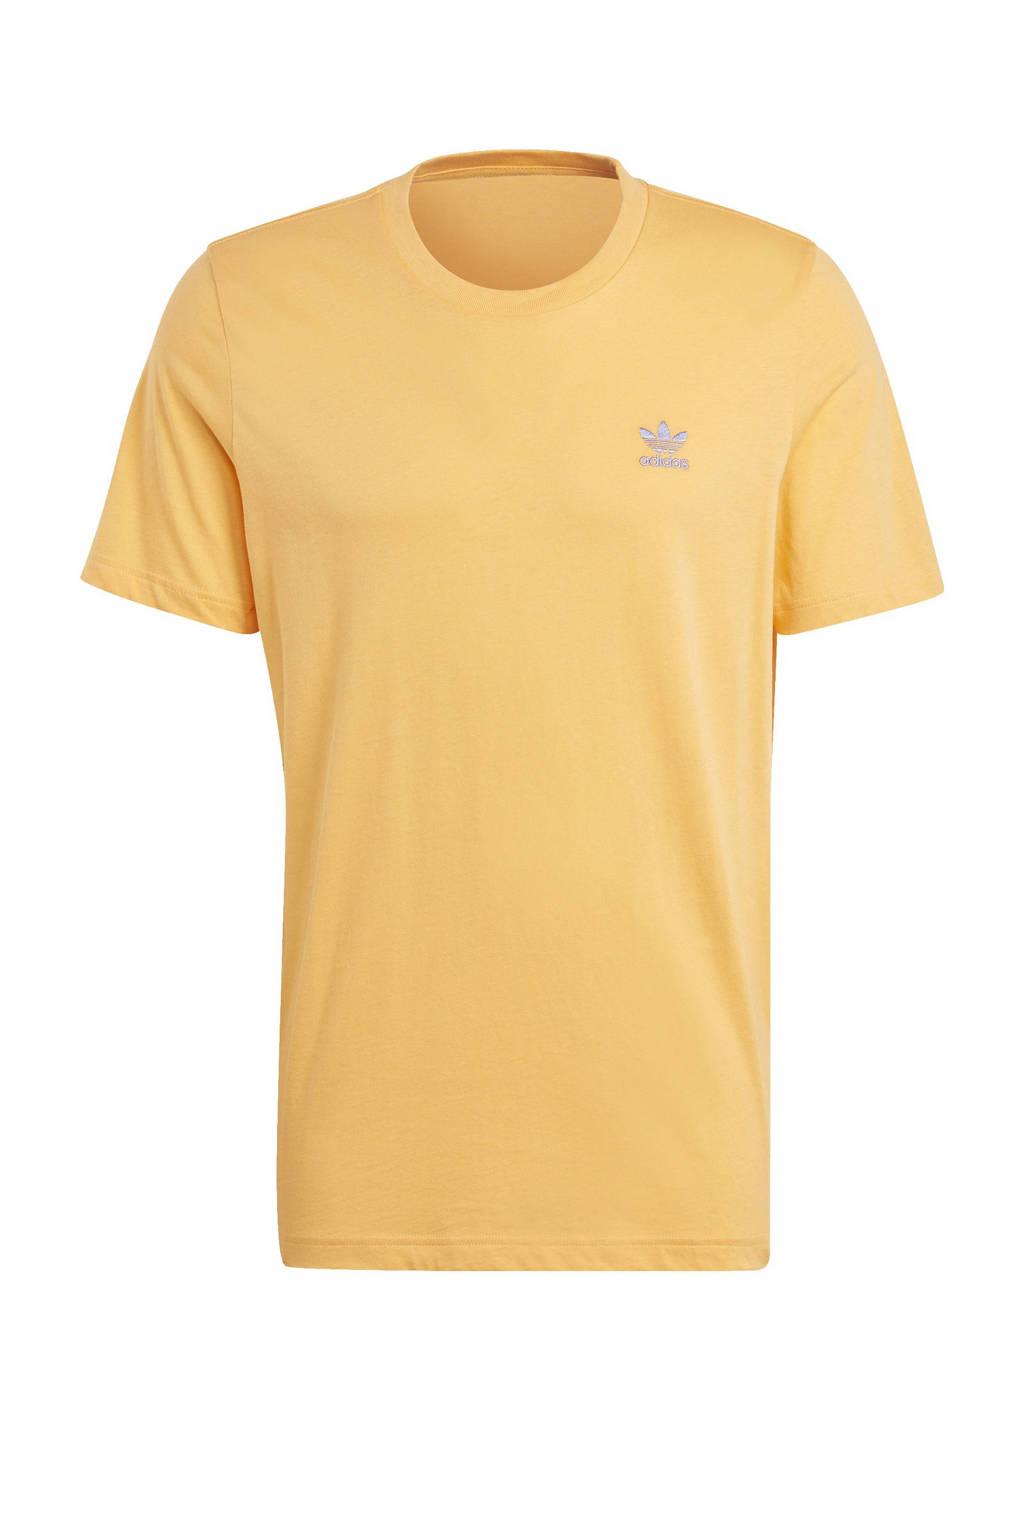 adidas Originals Adicolor T-shirt oranje, Oranje